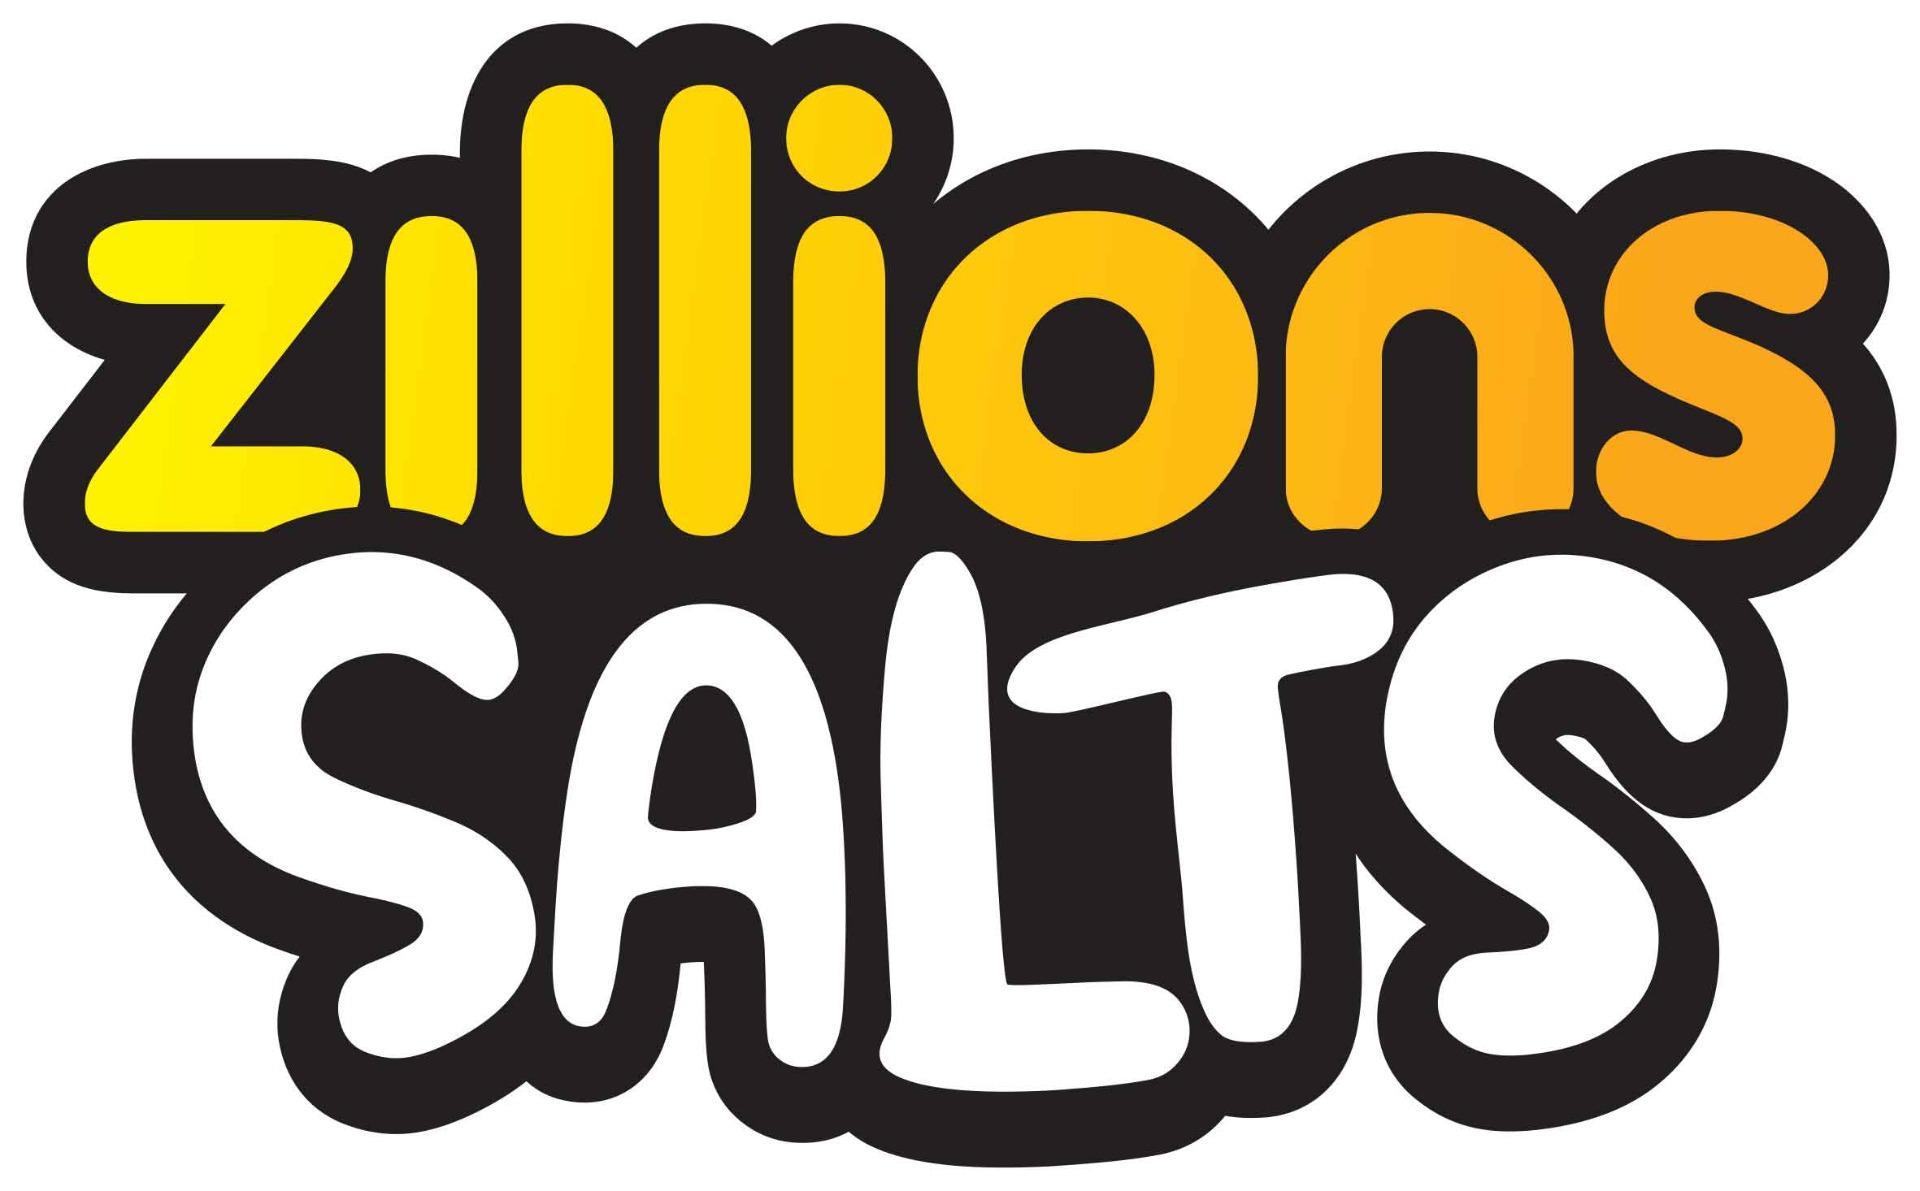 zillions-salts-logo.jpg